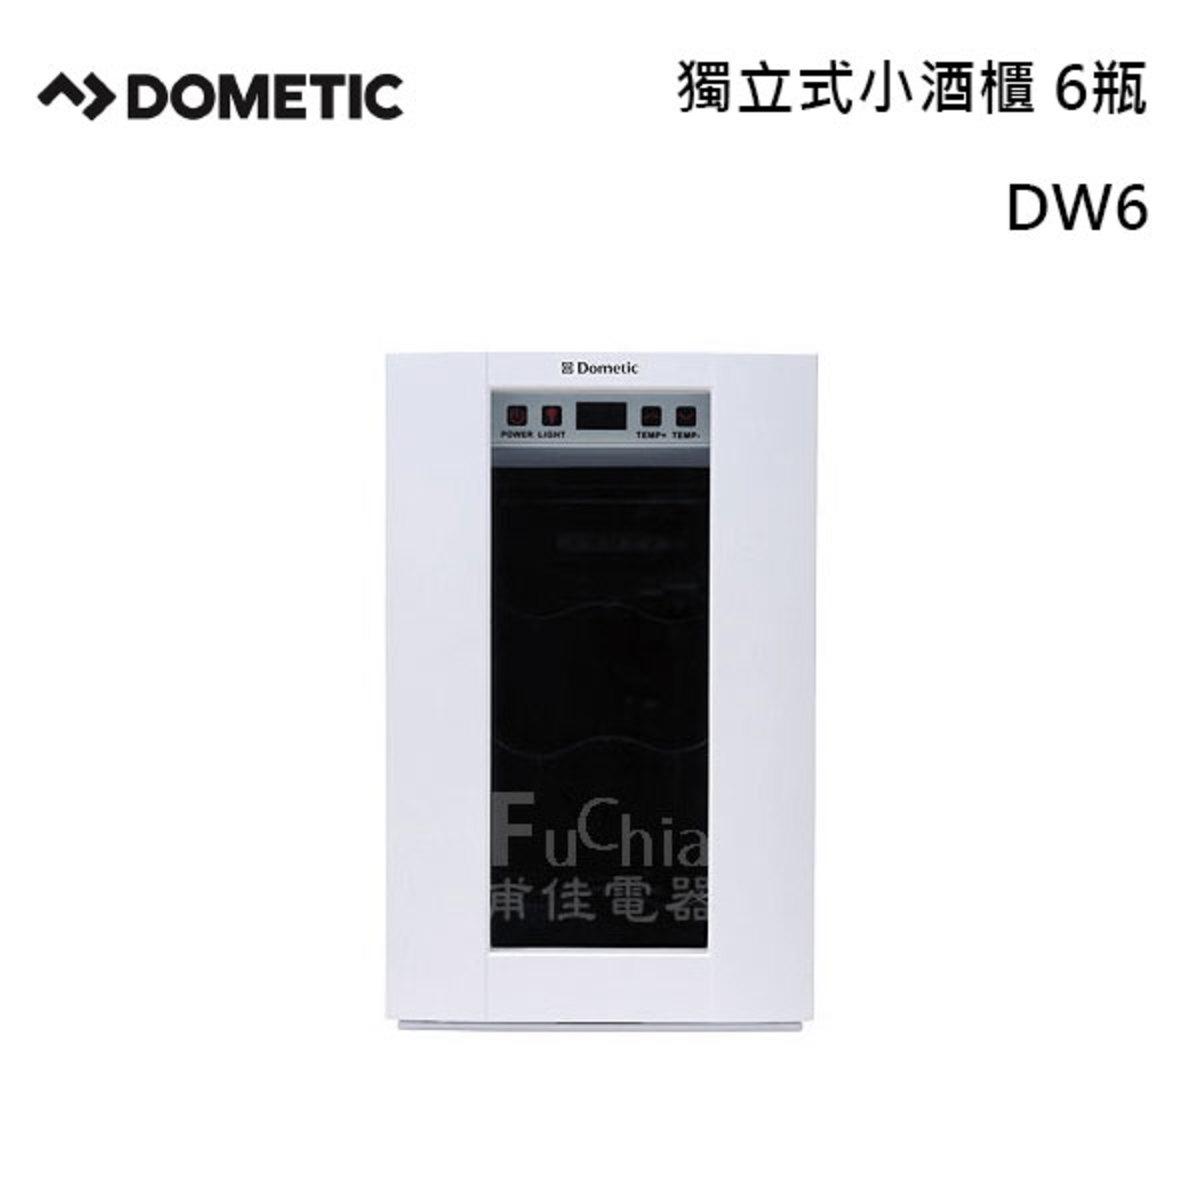 Dometic DW6 小型酒櫃 (製冷晶片型) 6瓶